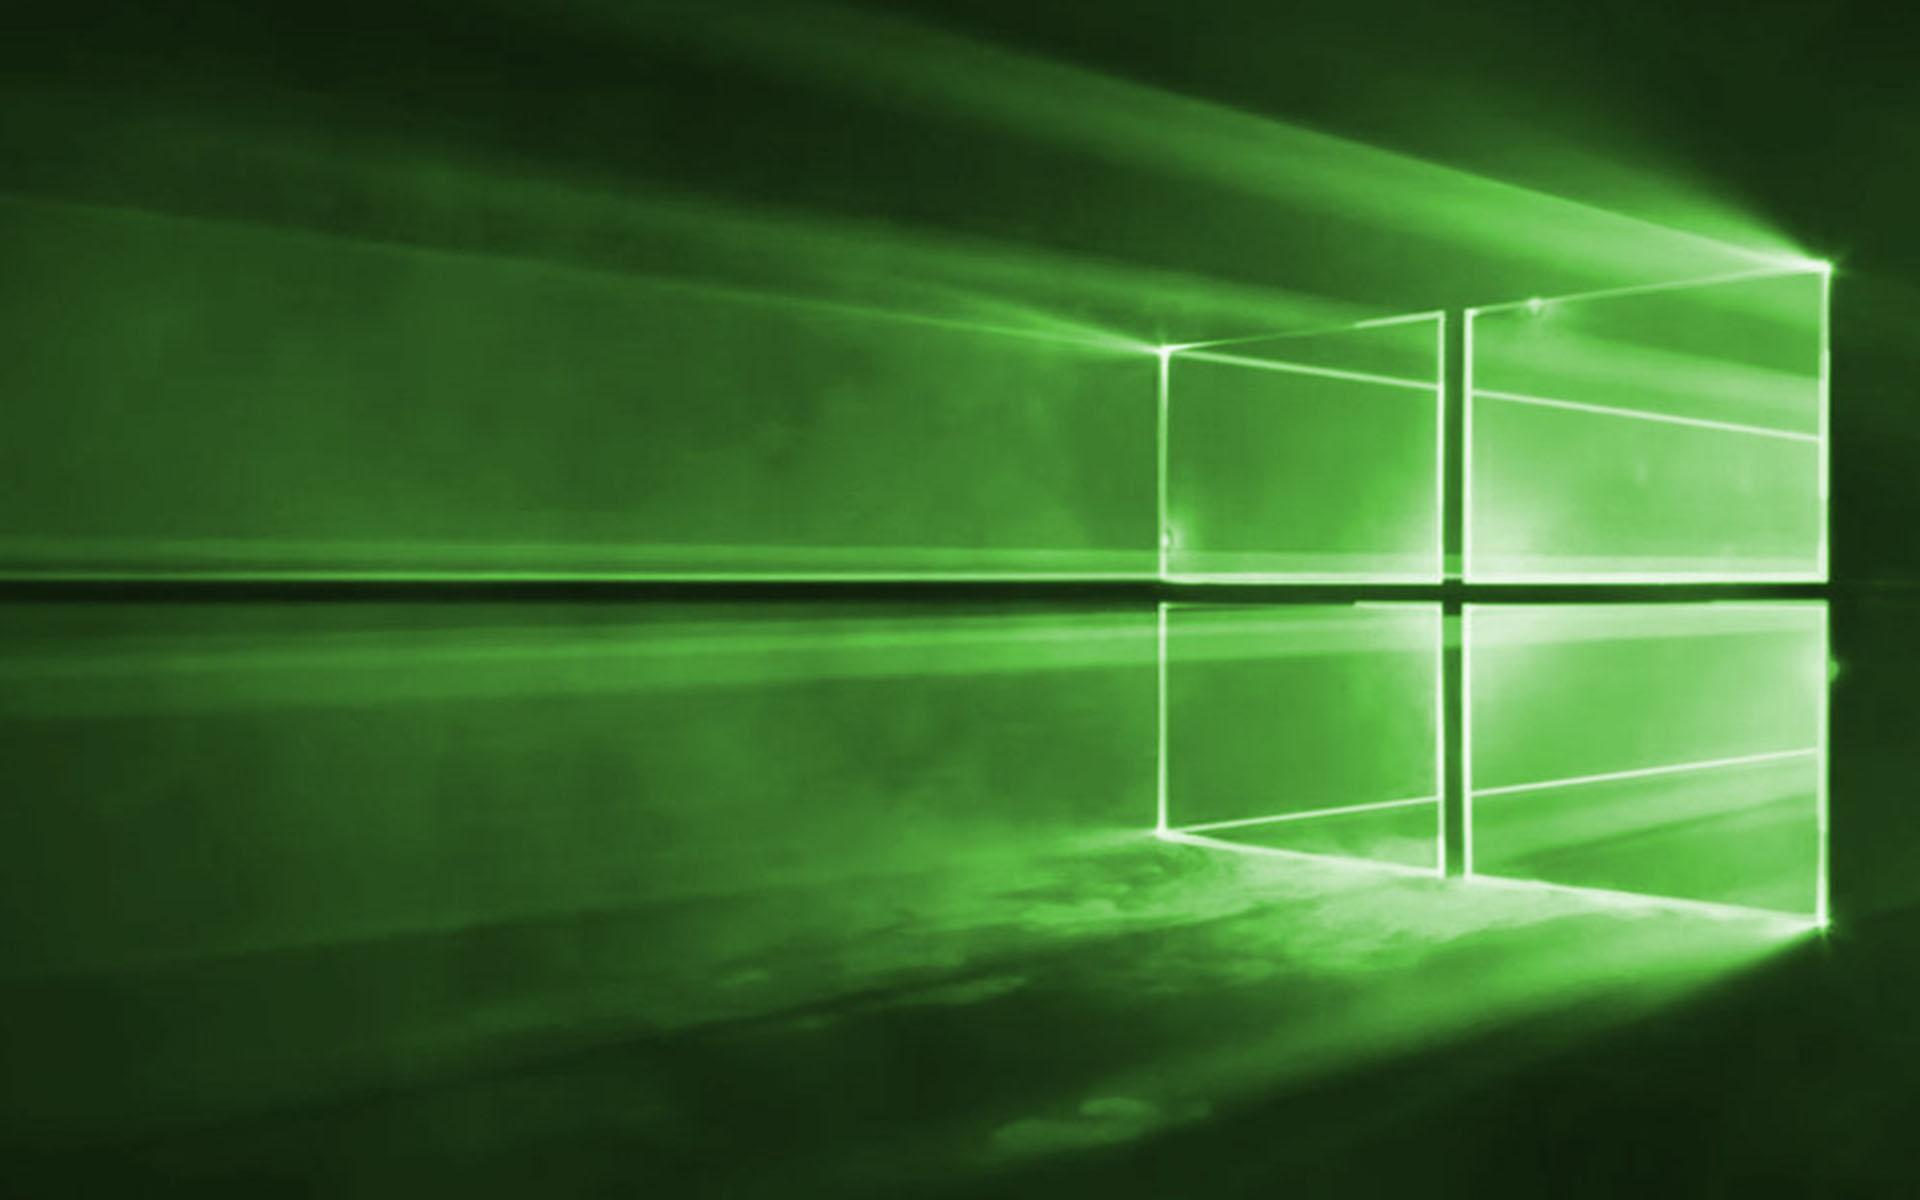 Background Wallpaper for Windows 10 - WallpaperSafari